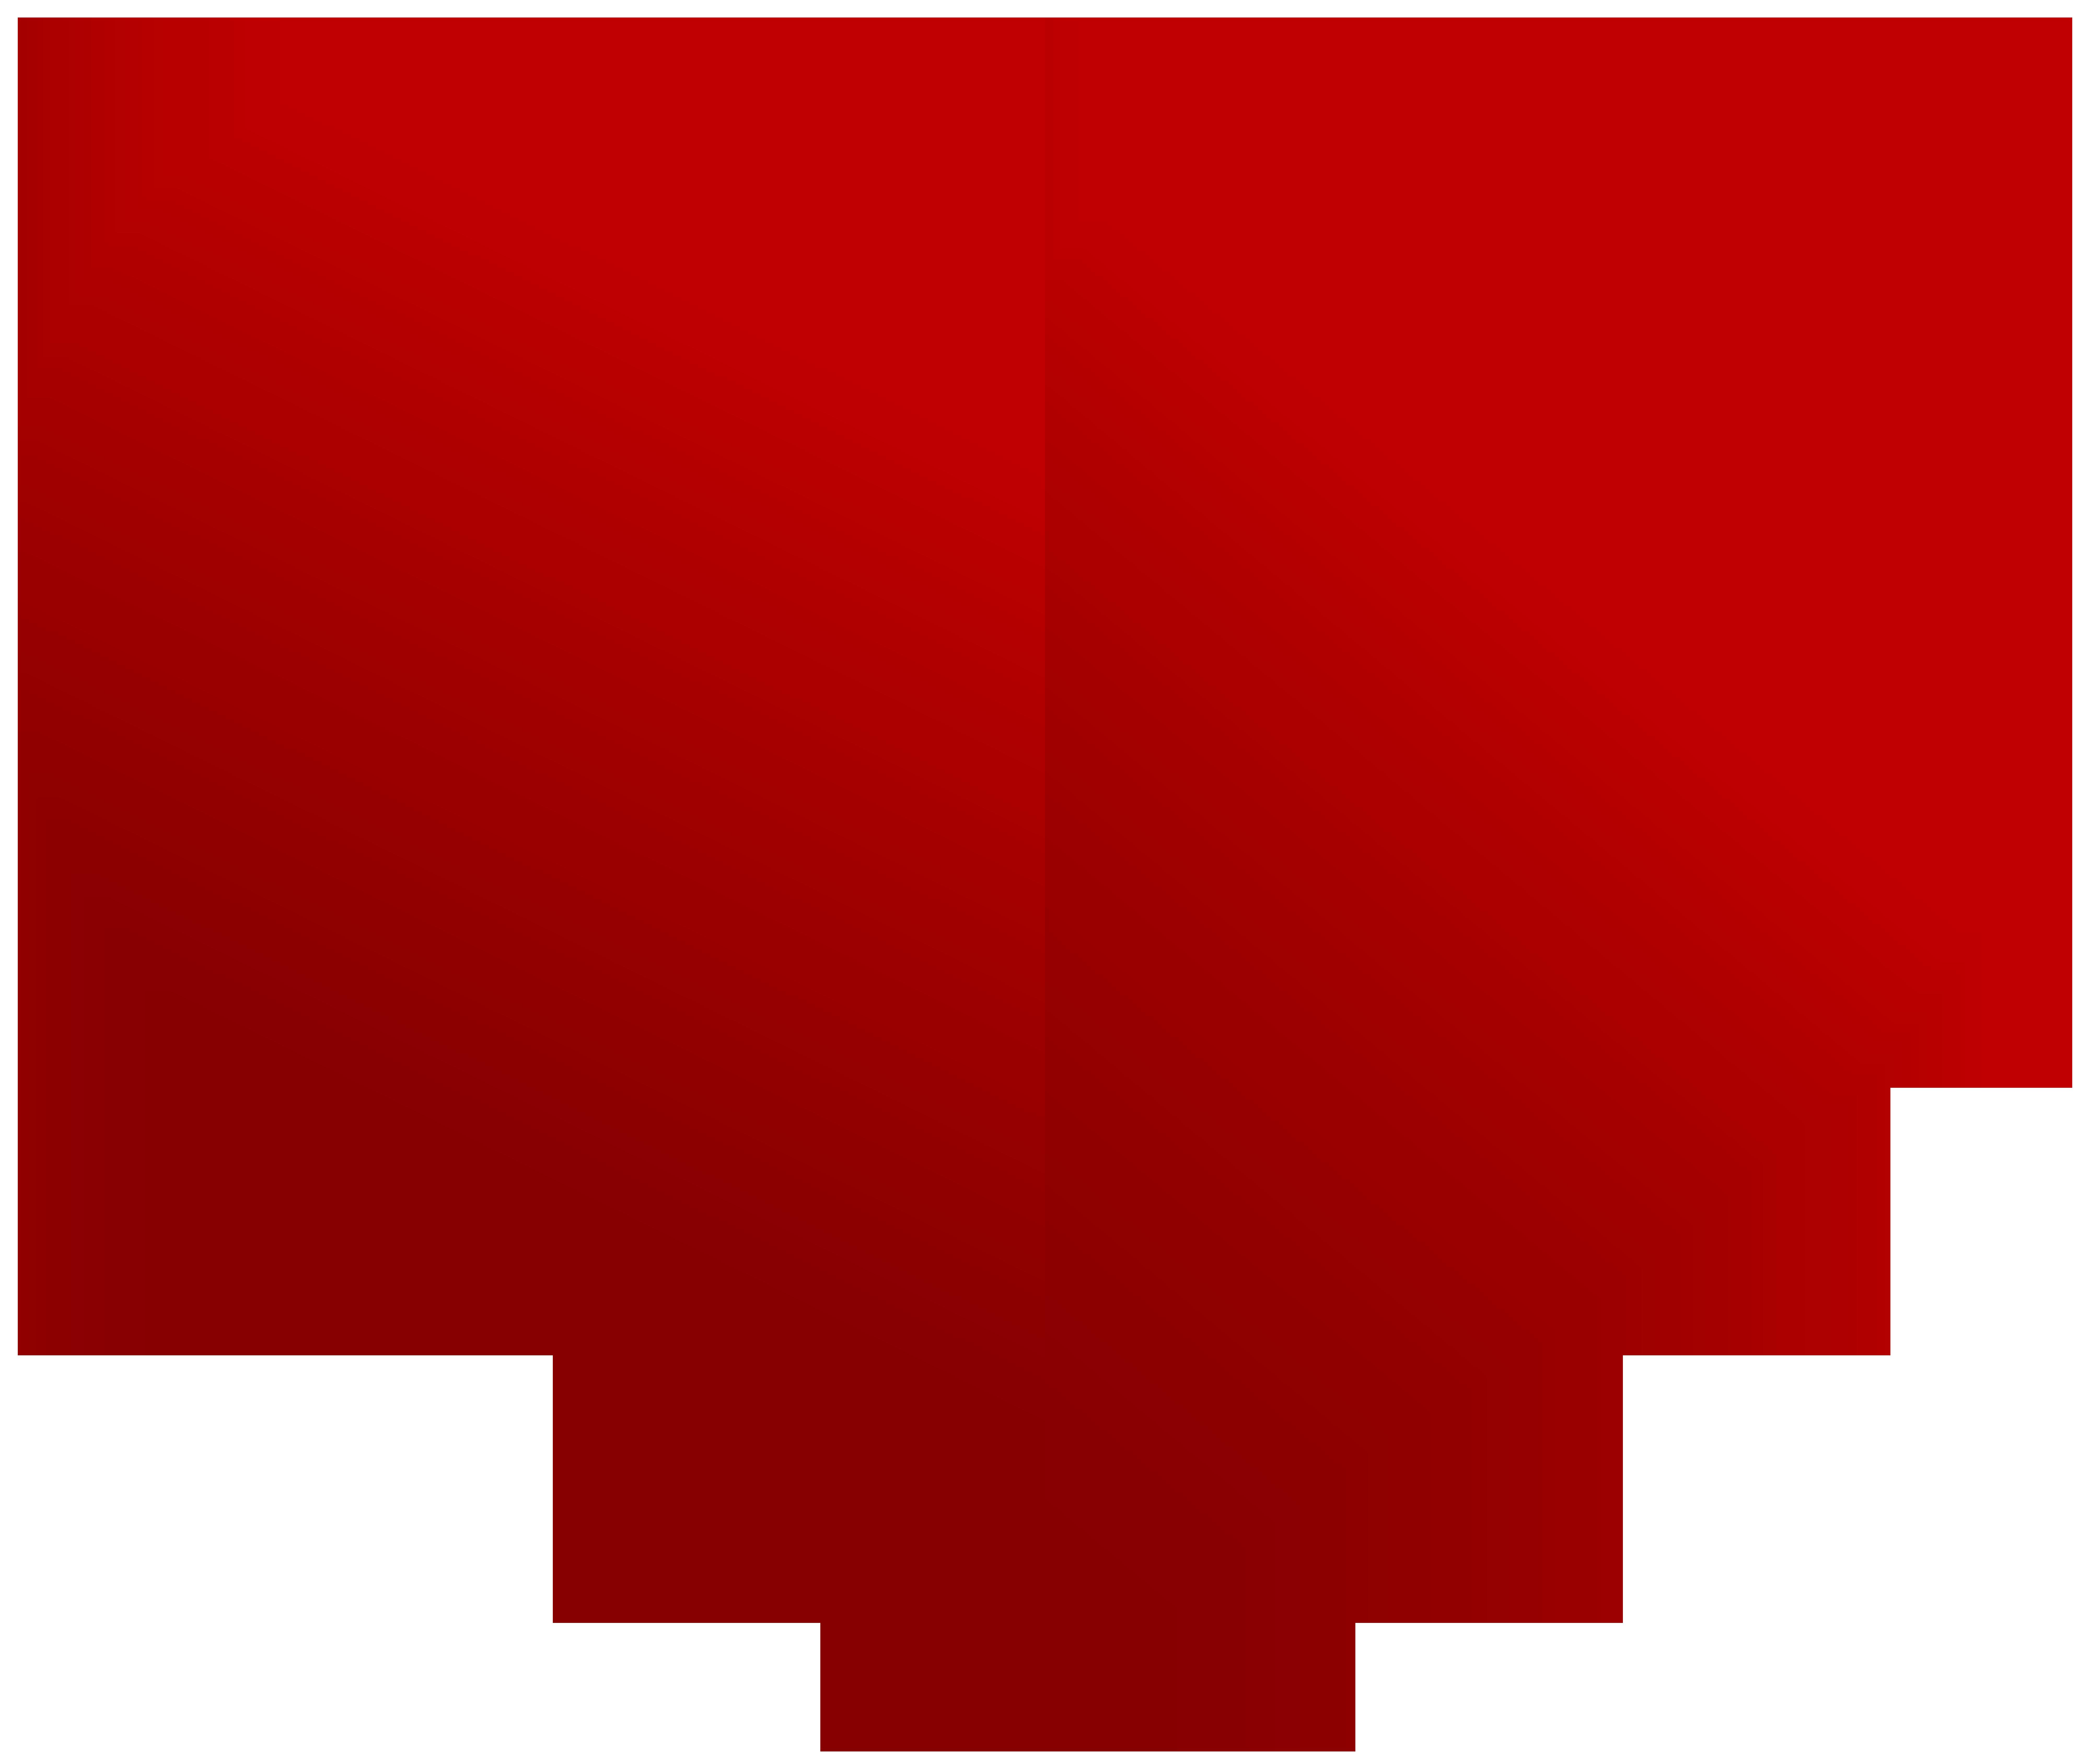 clipart heart body